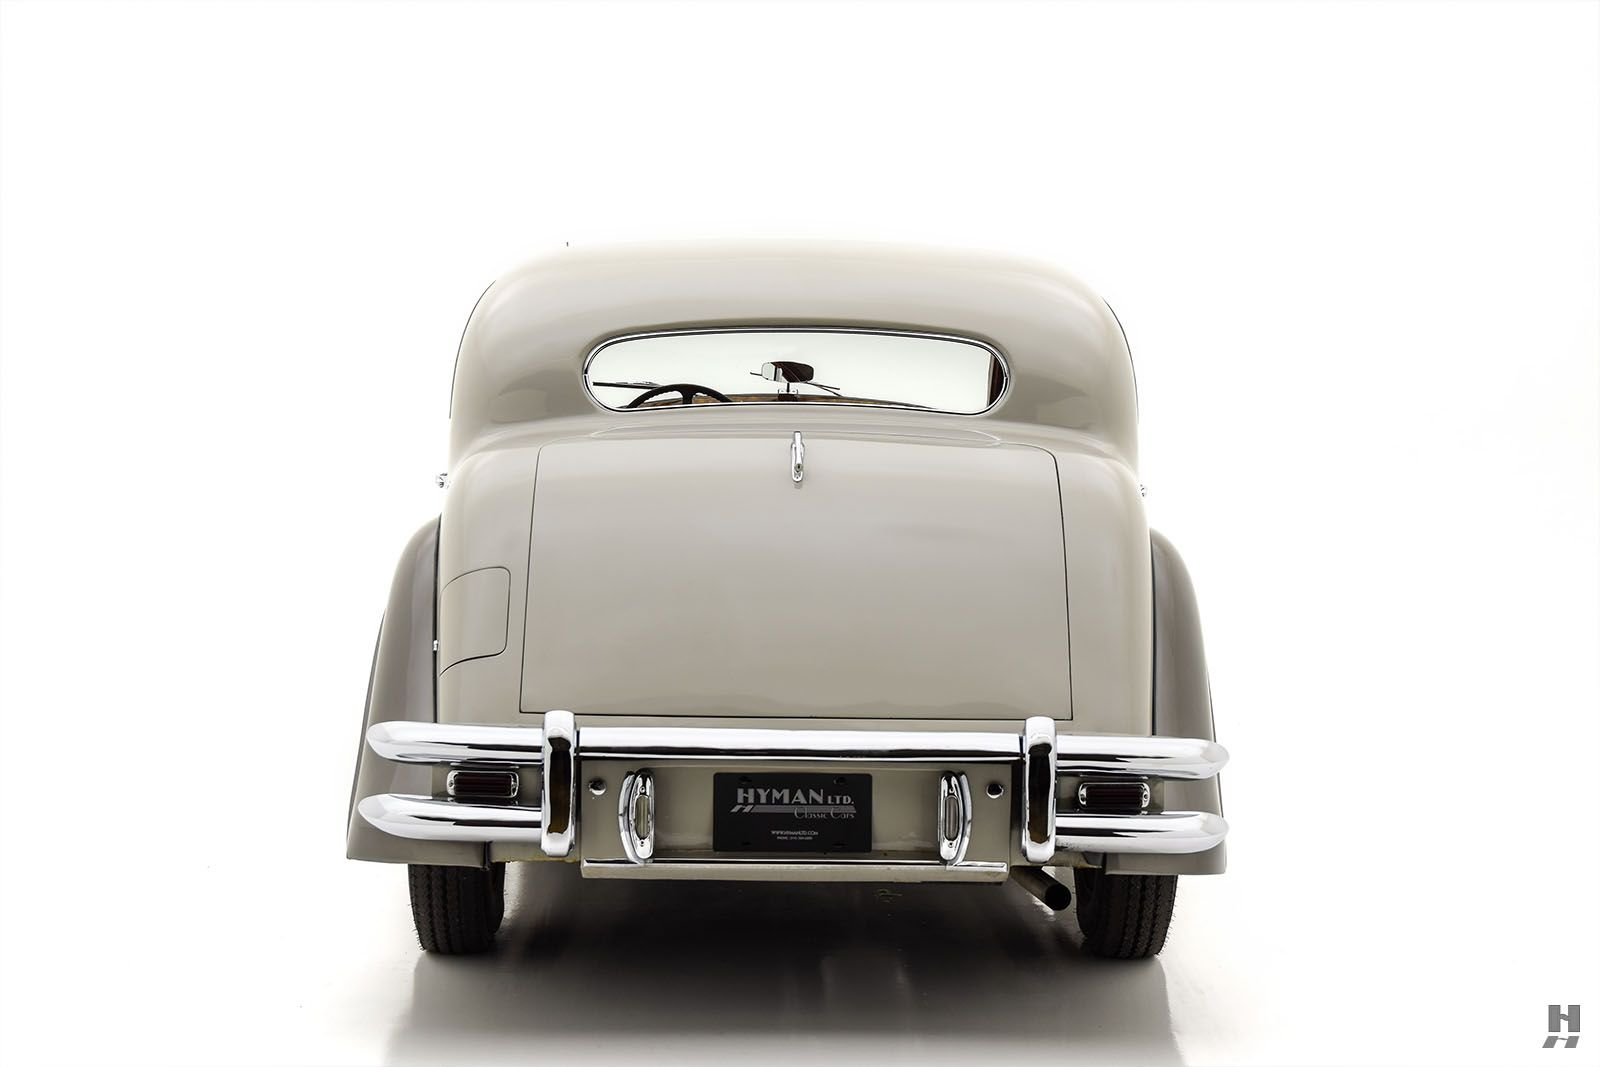 1950 Jaguar Mkv Saloon Precious And Rare Cars Ameriki Jaguar